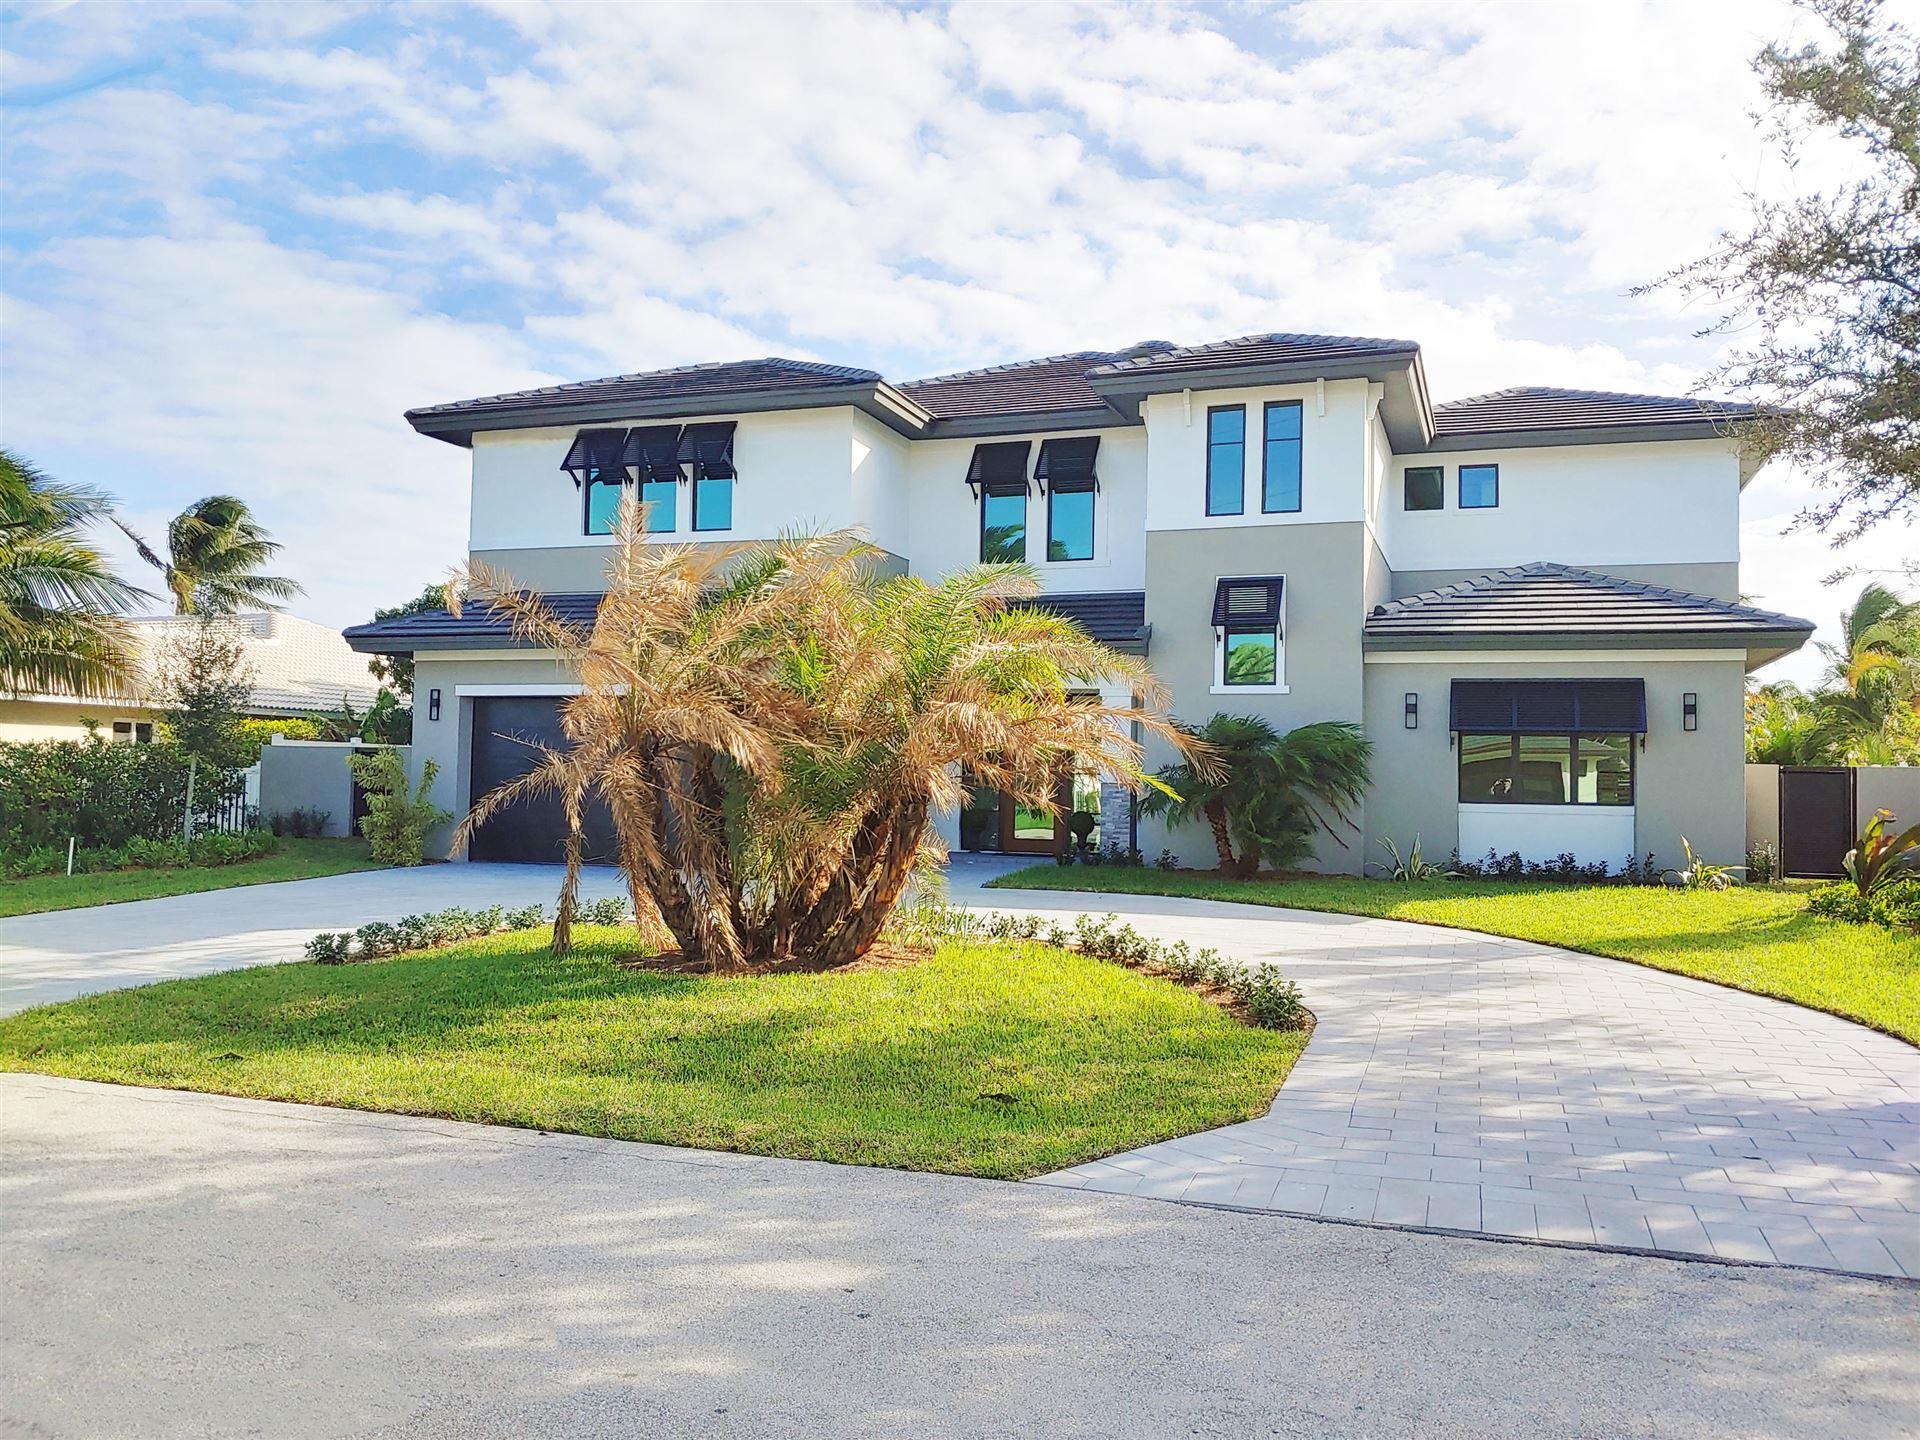 770 Enfield Street, Boca Raton, FL 33487 - MLS#: RX-10595861